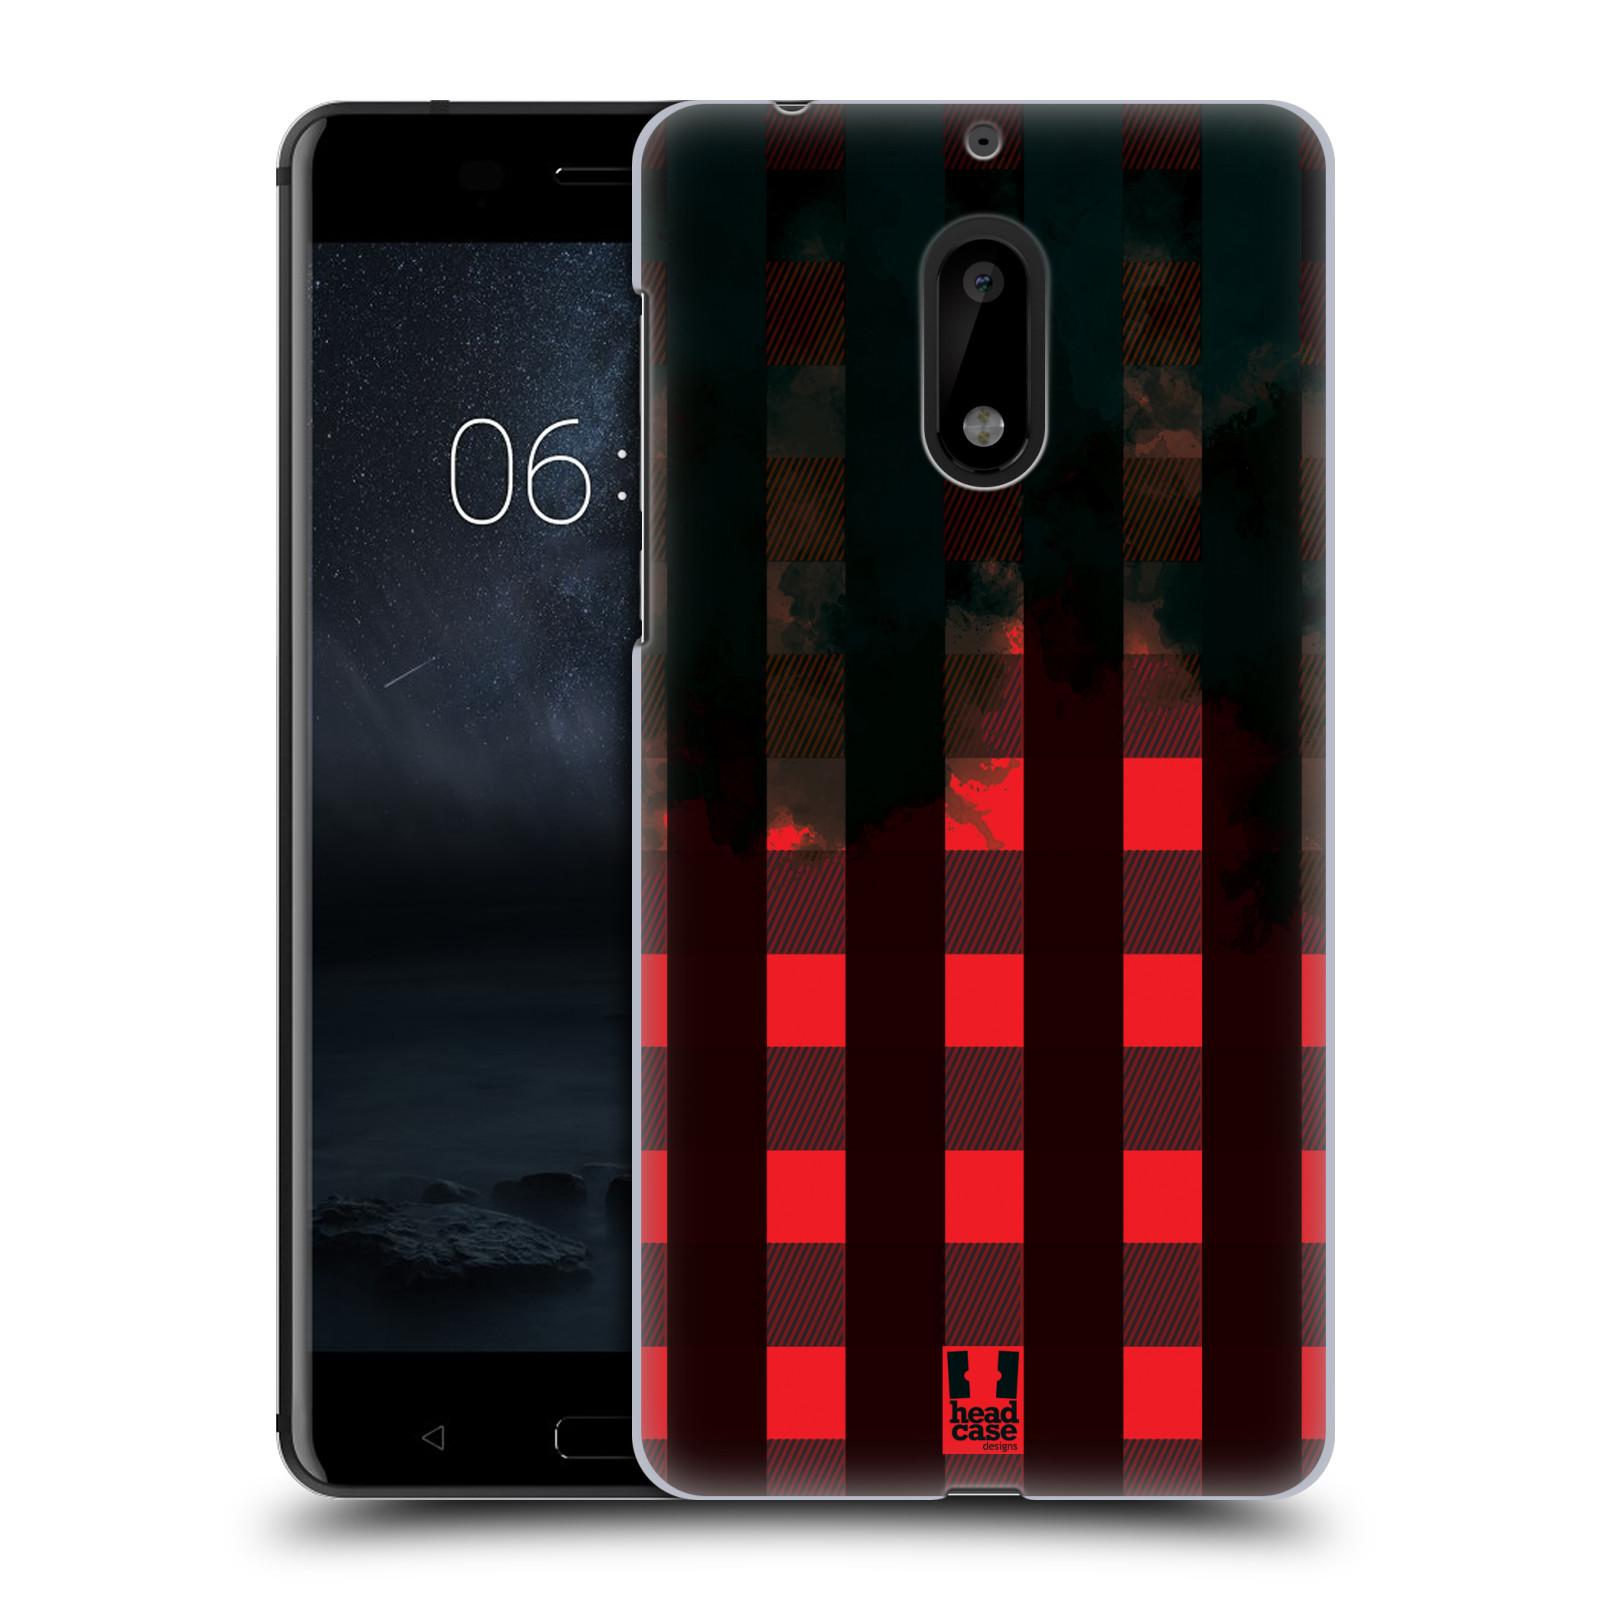 Plastové pouzdro na mobil Nokia 6 - Head Case FLANEL RED BLACK (Plastový kryt či obal na mobilní telefon Nokia 6 (Dual SIM))